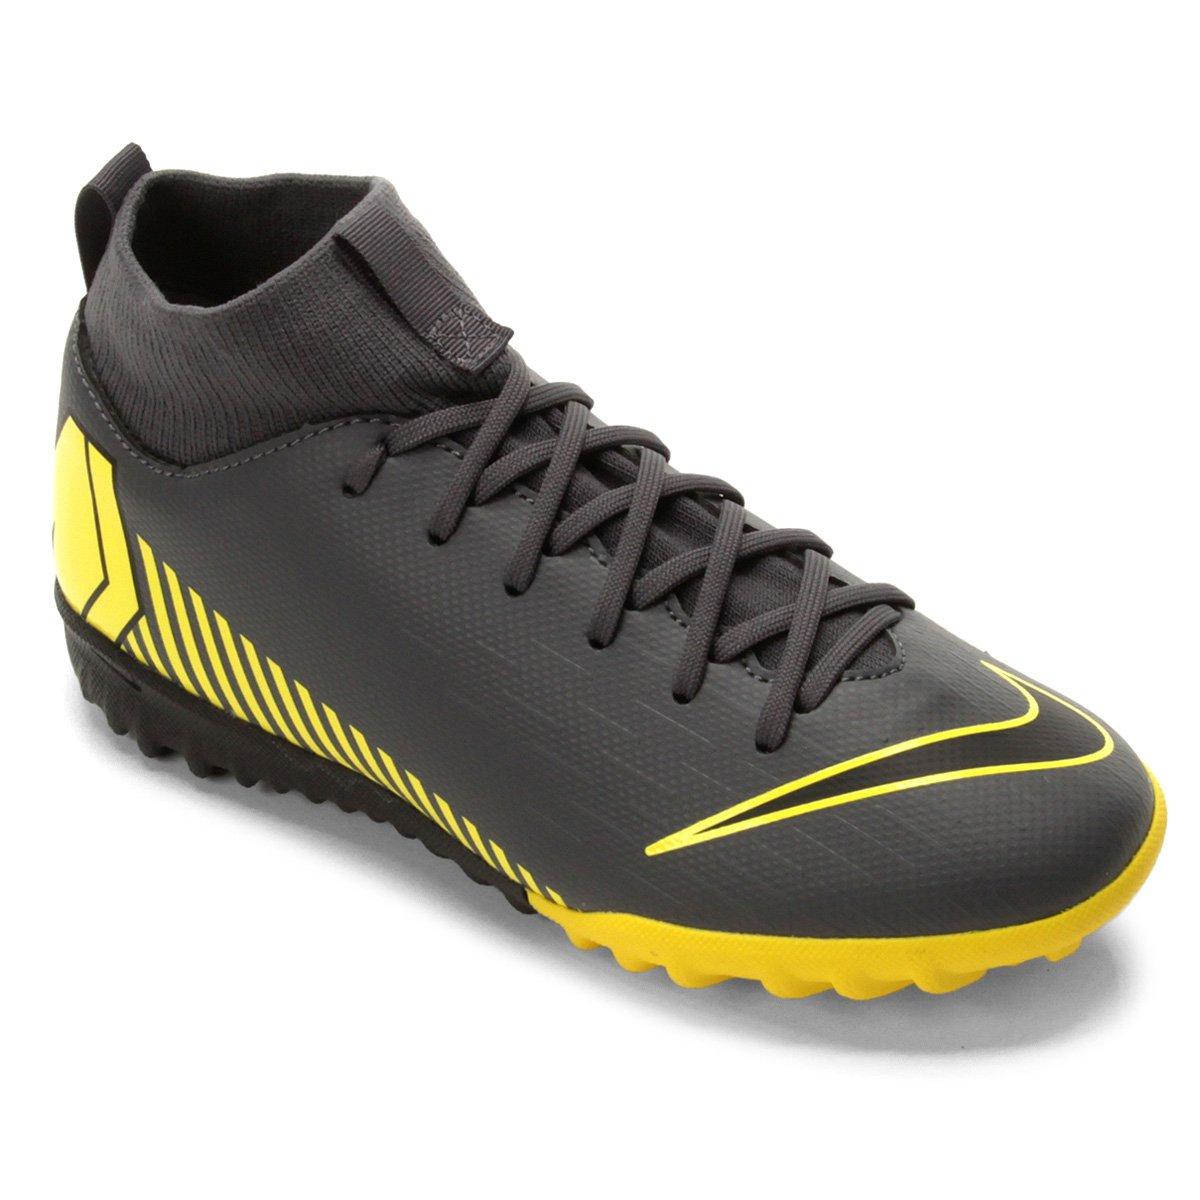 604ce4886a Chuteira Society Infantil Nike Superfly 6 Academy Gs TF - Cinza ...